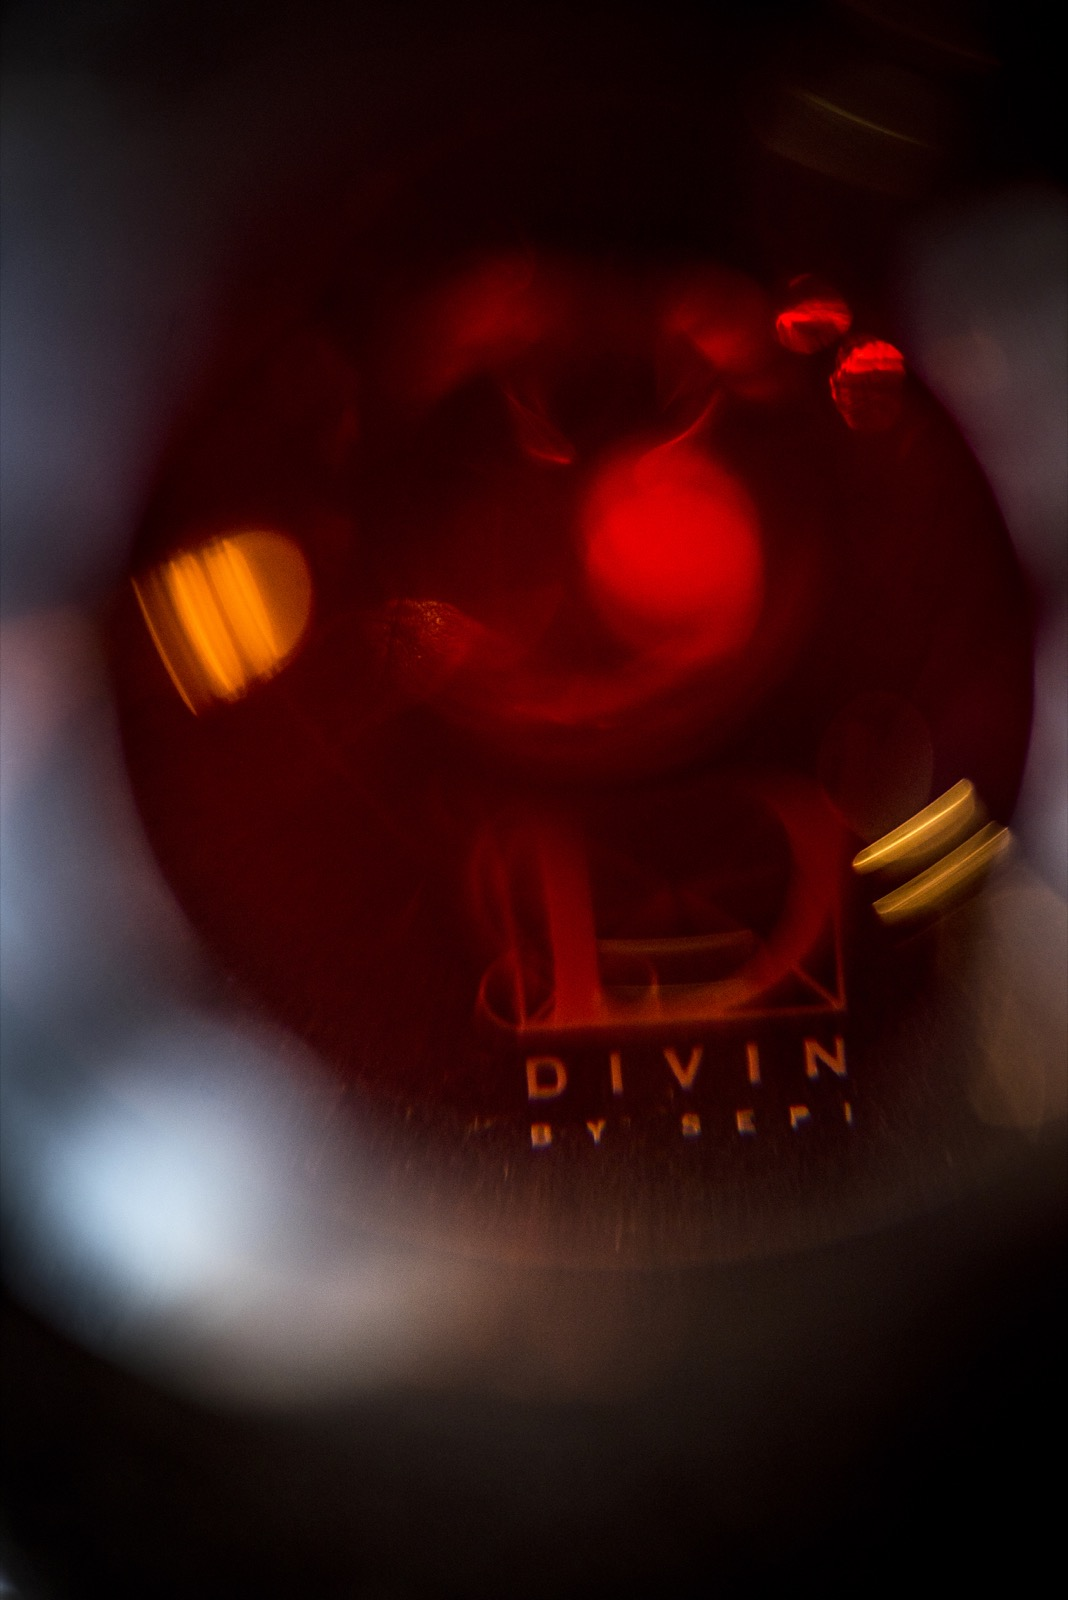 divin_©_kris_vlegels_0001.jpg